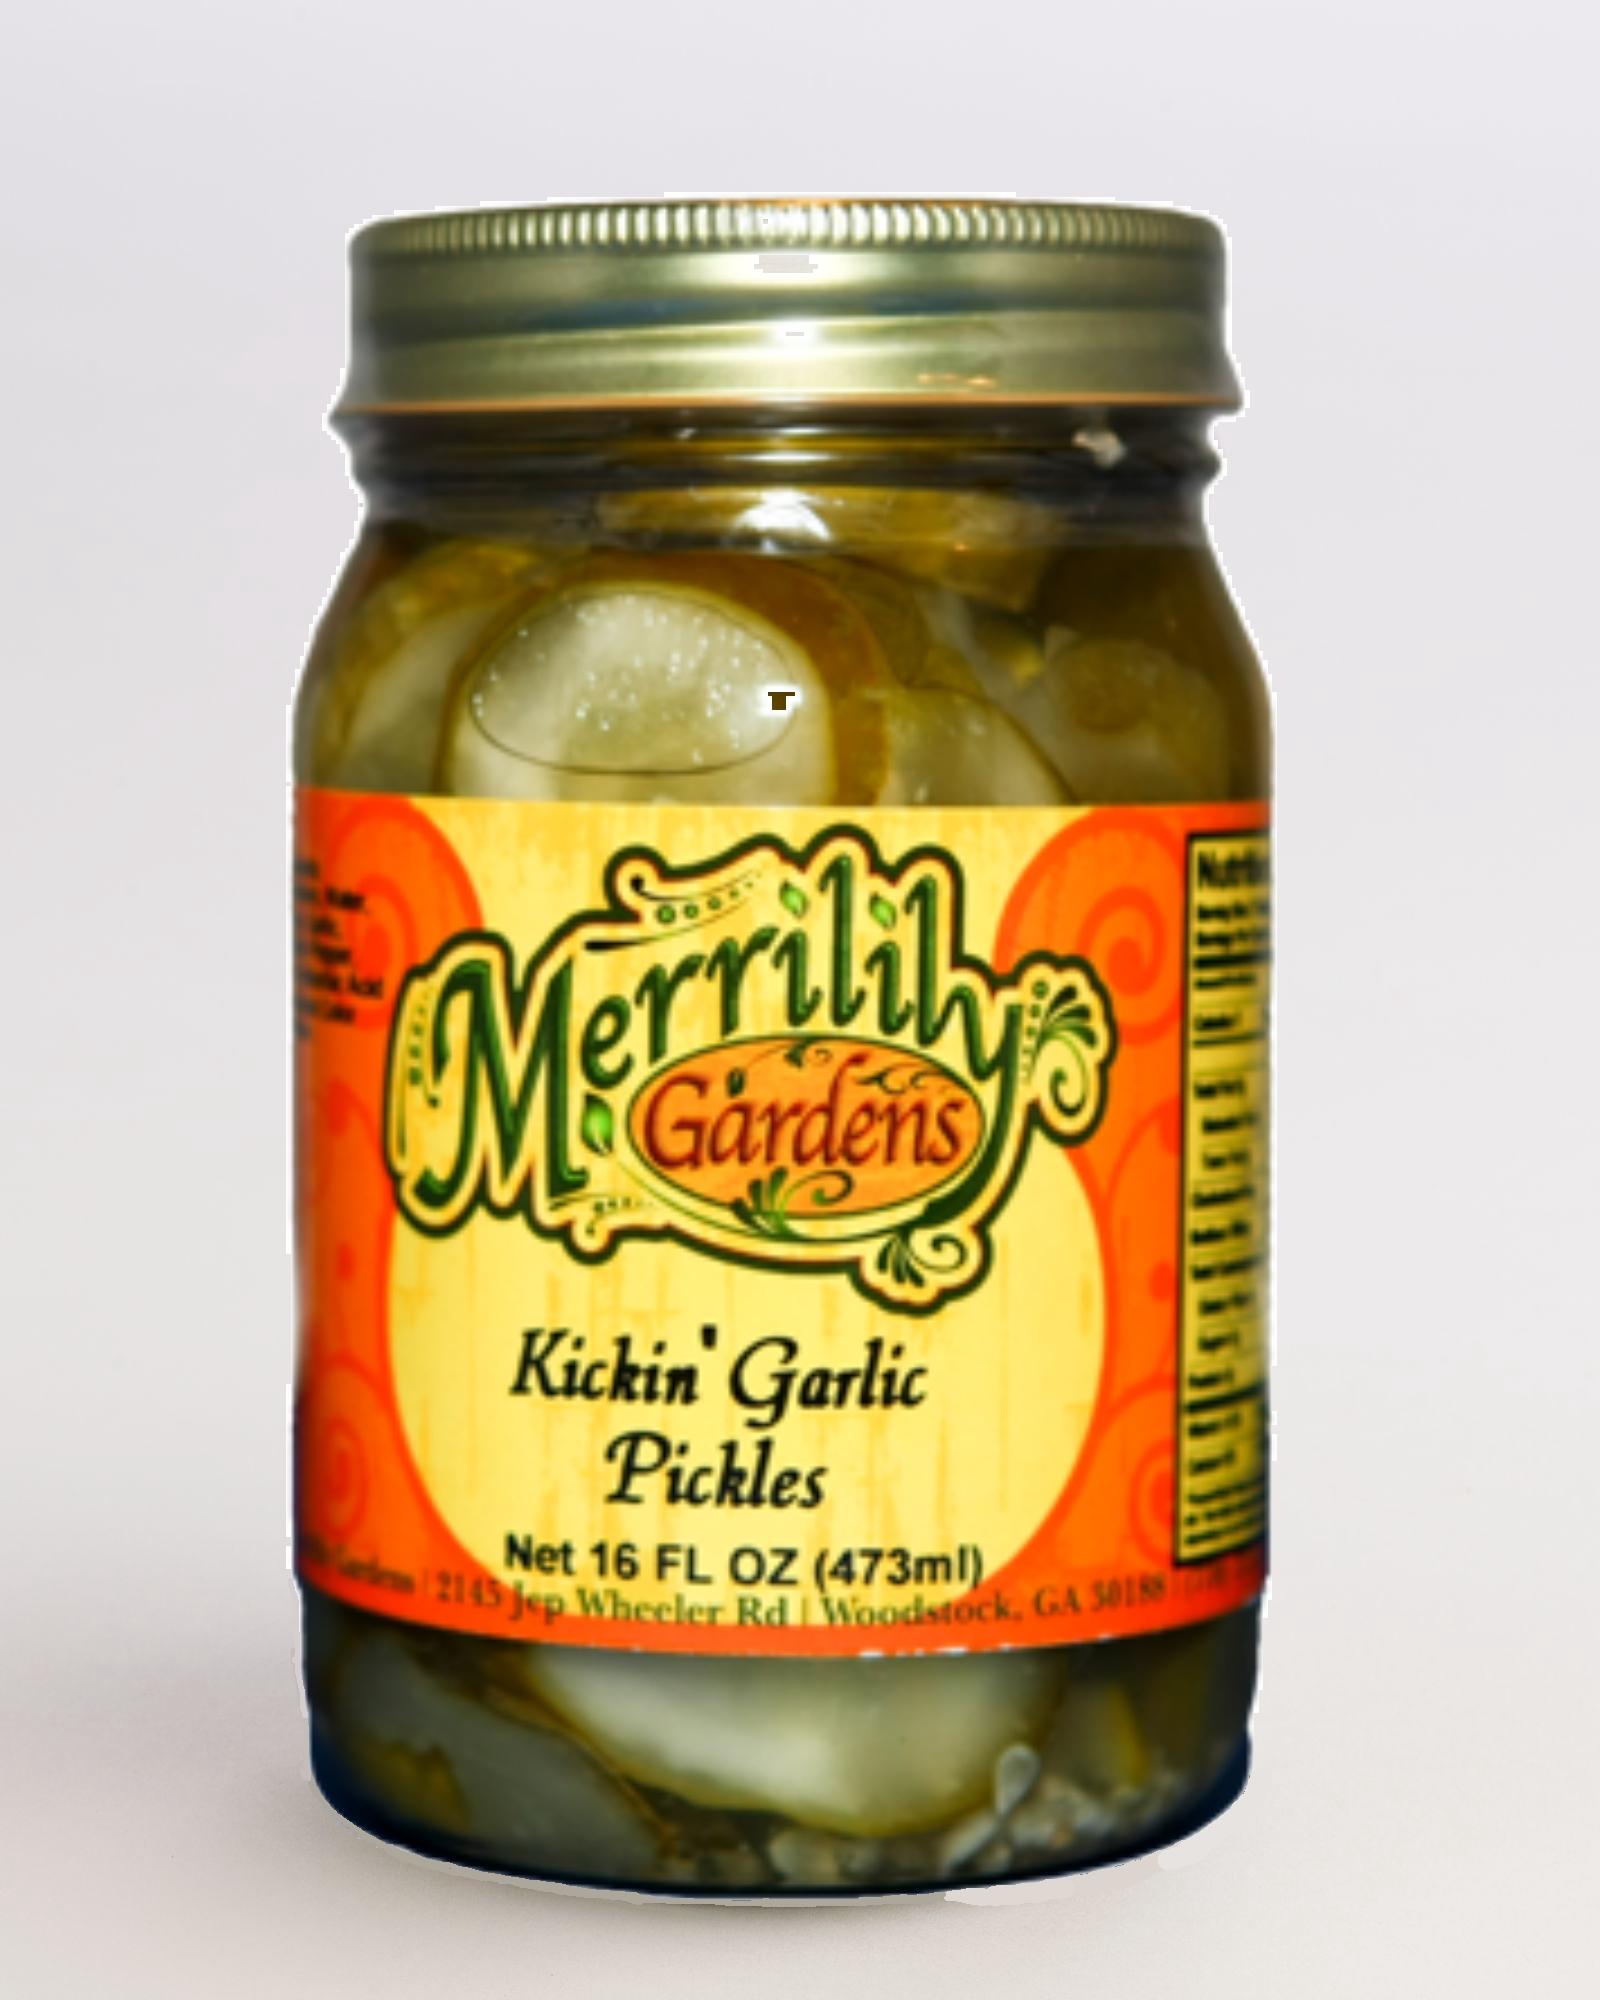 Kickin' Garlic Pickles